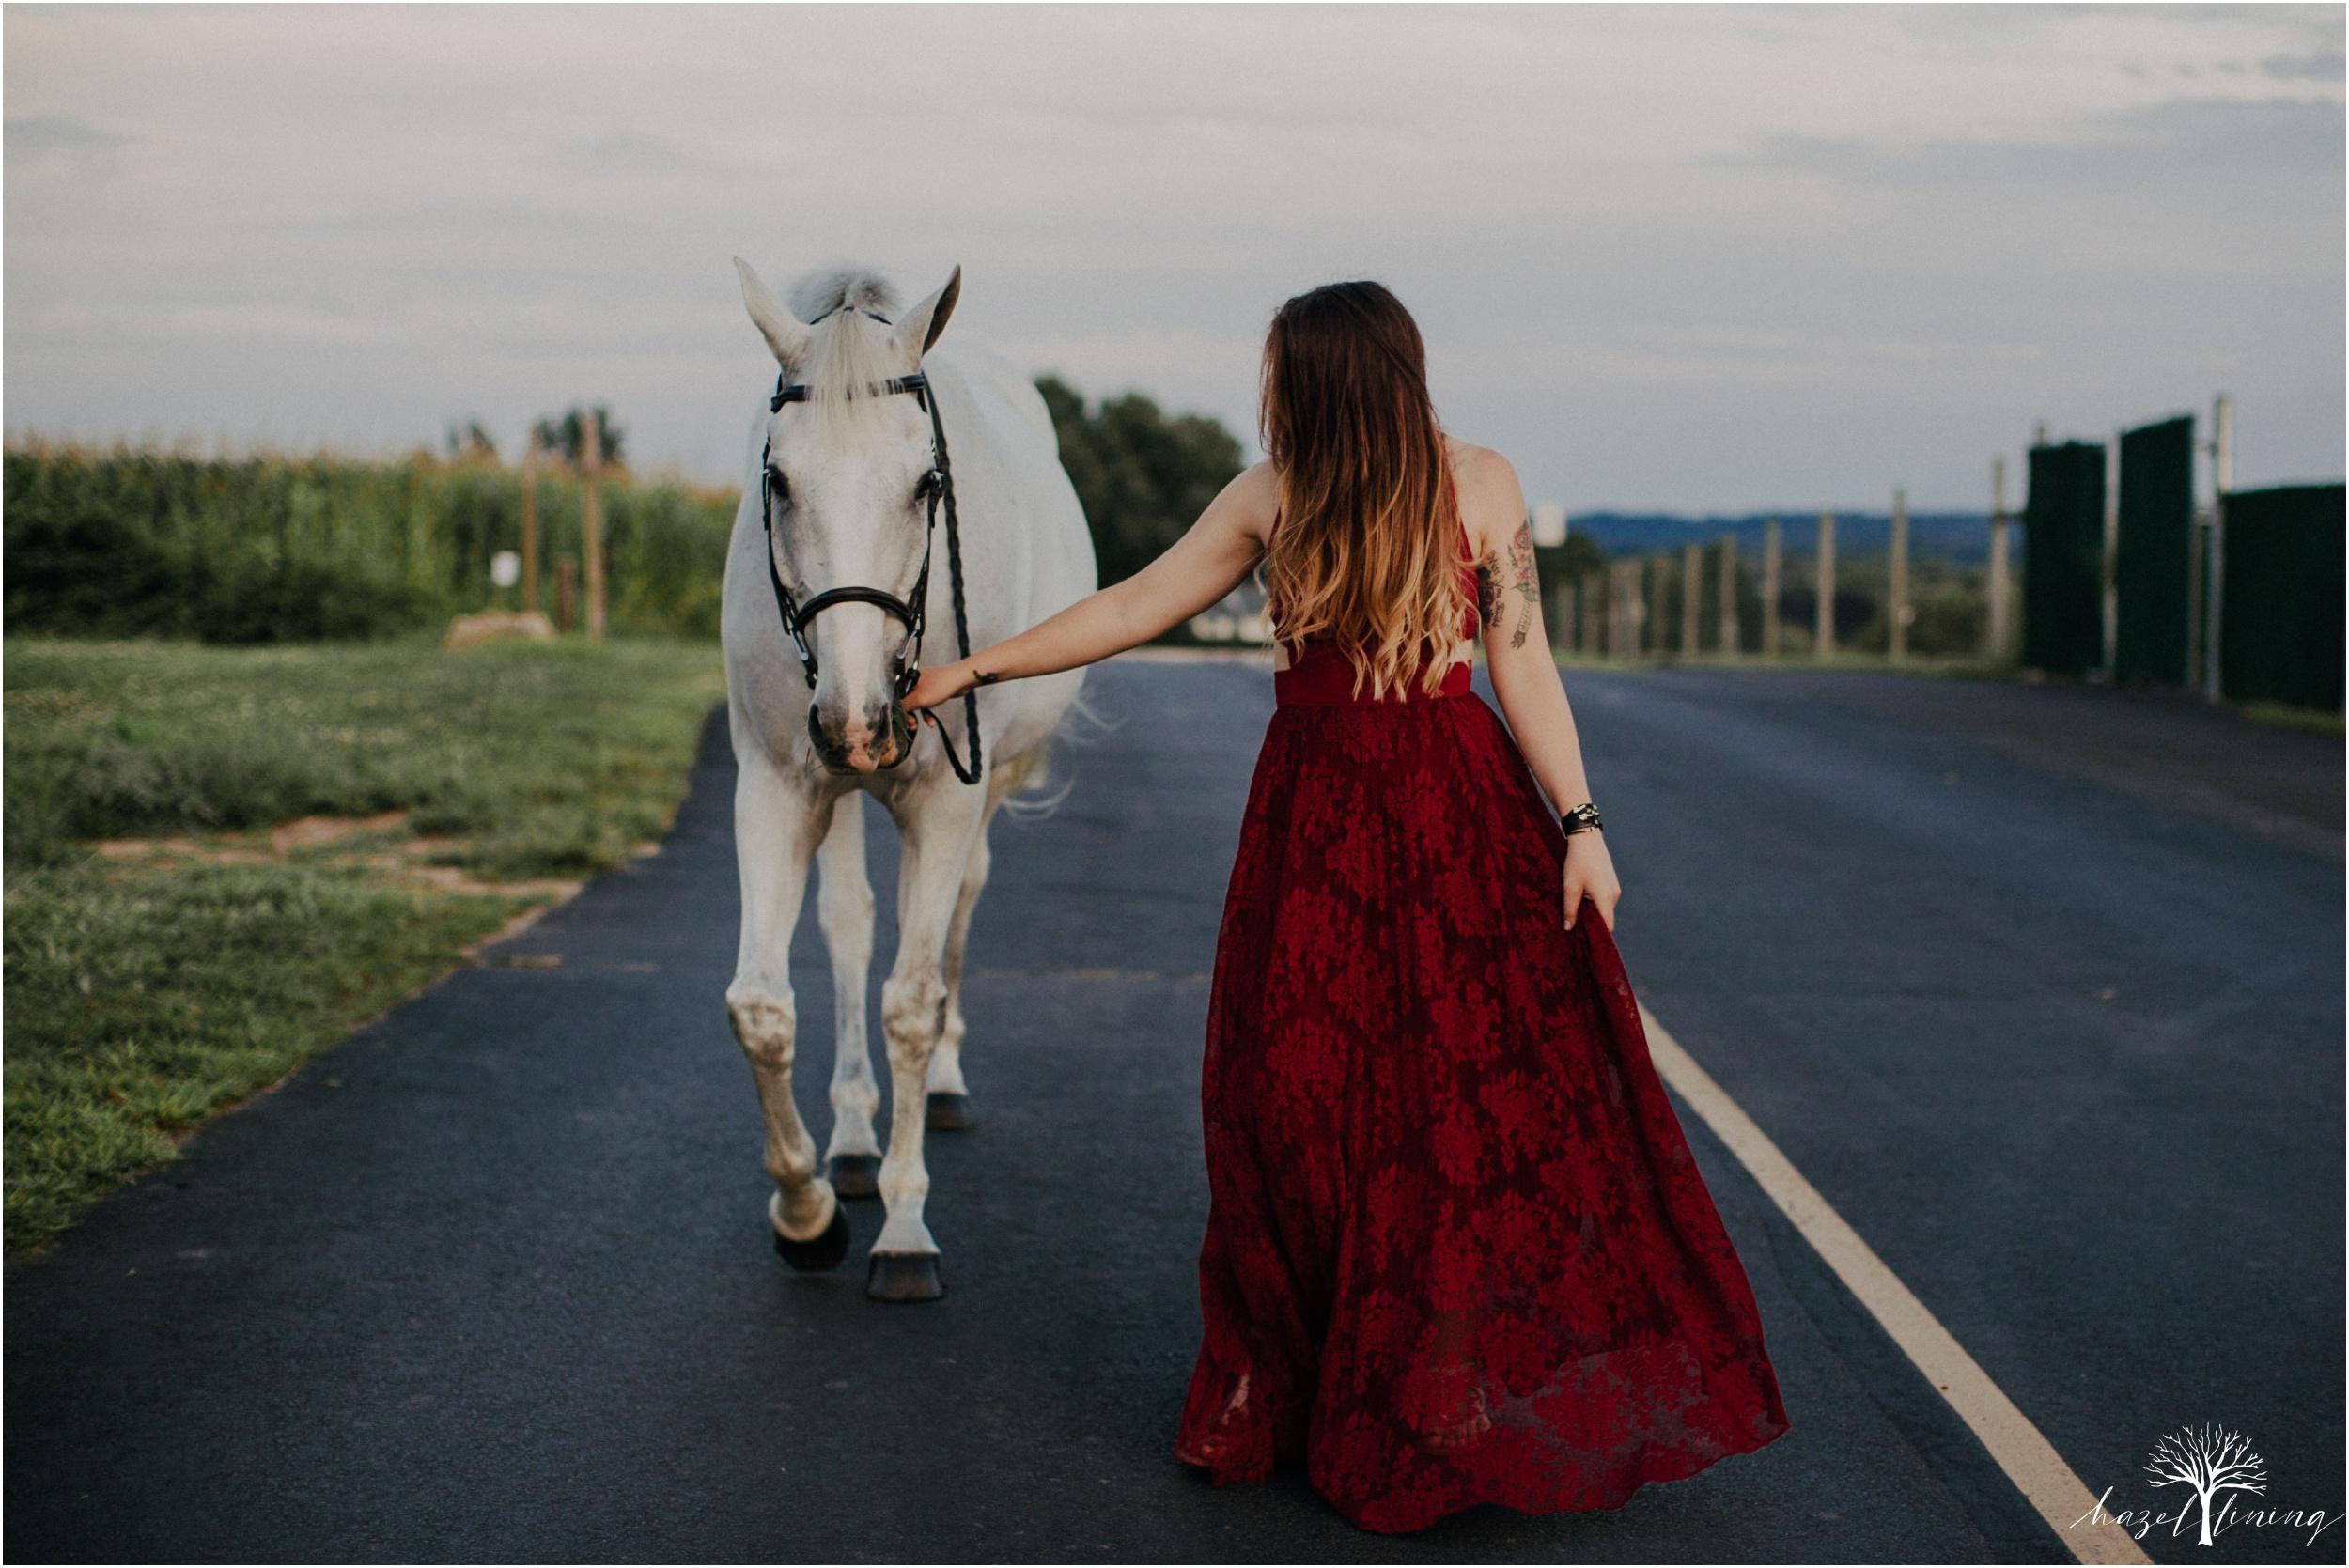 taylor-adams-and-horse-delaware-valley-university-delval-summer-equestrian-portrait-session-hazel-lining-photography-destination-elopement-wedding-engagement-photography_0055.jpg